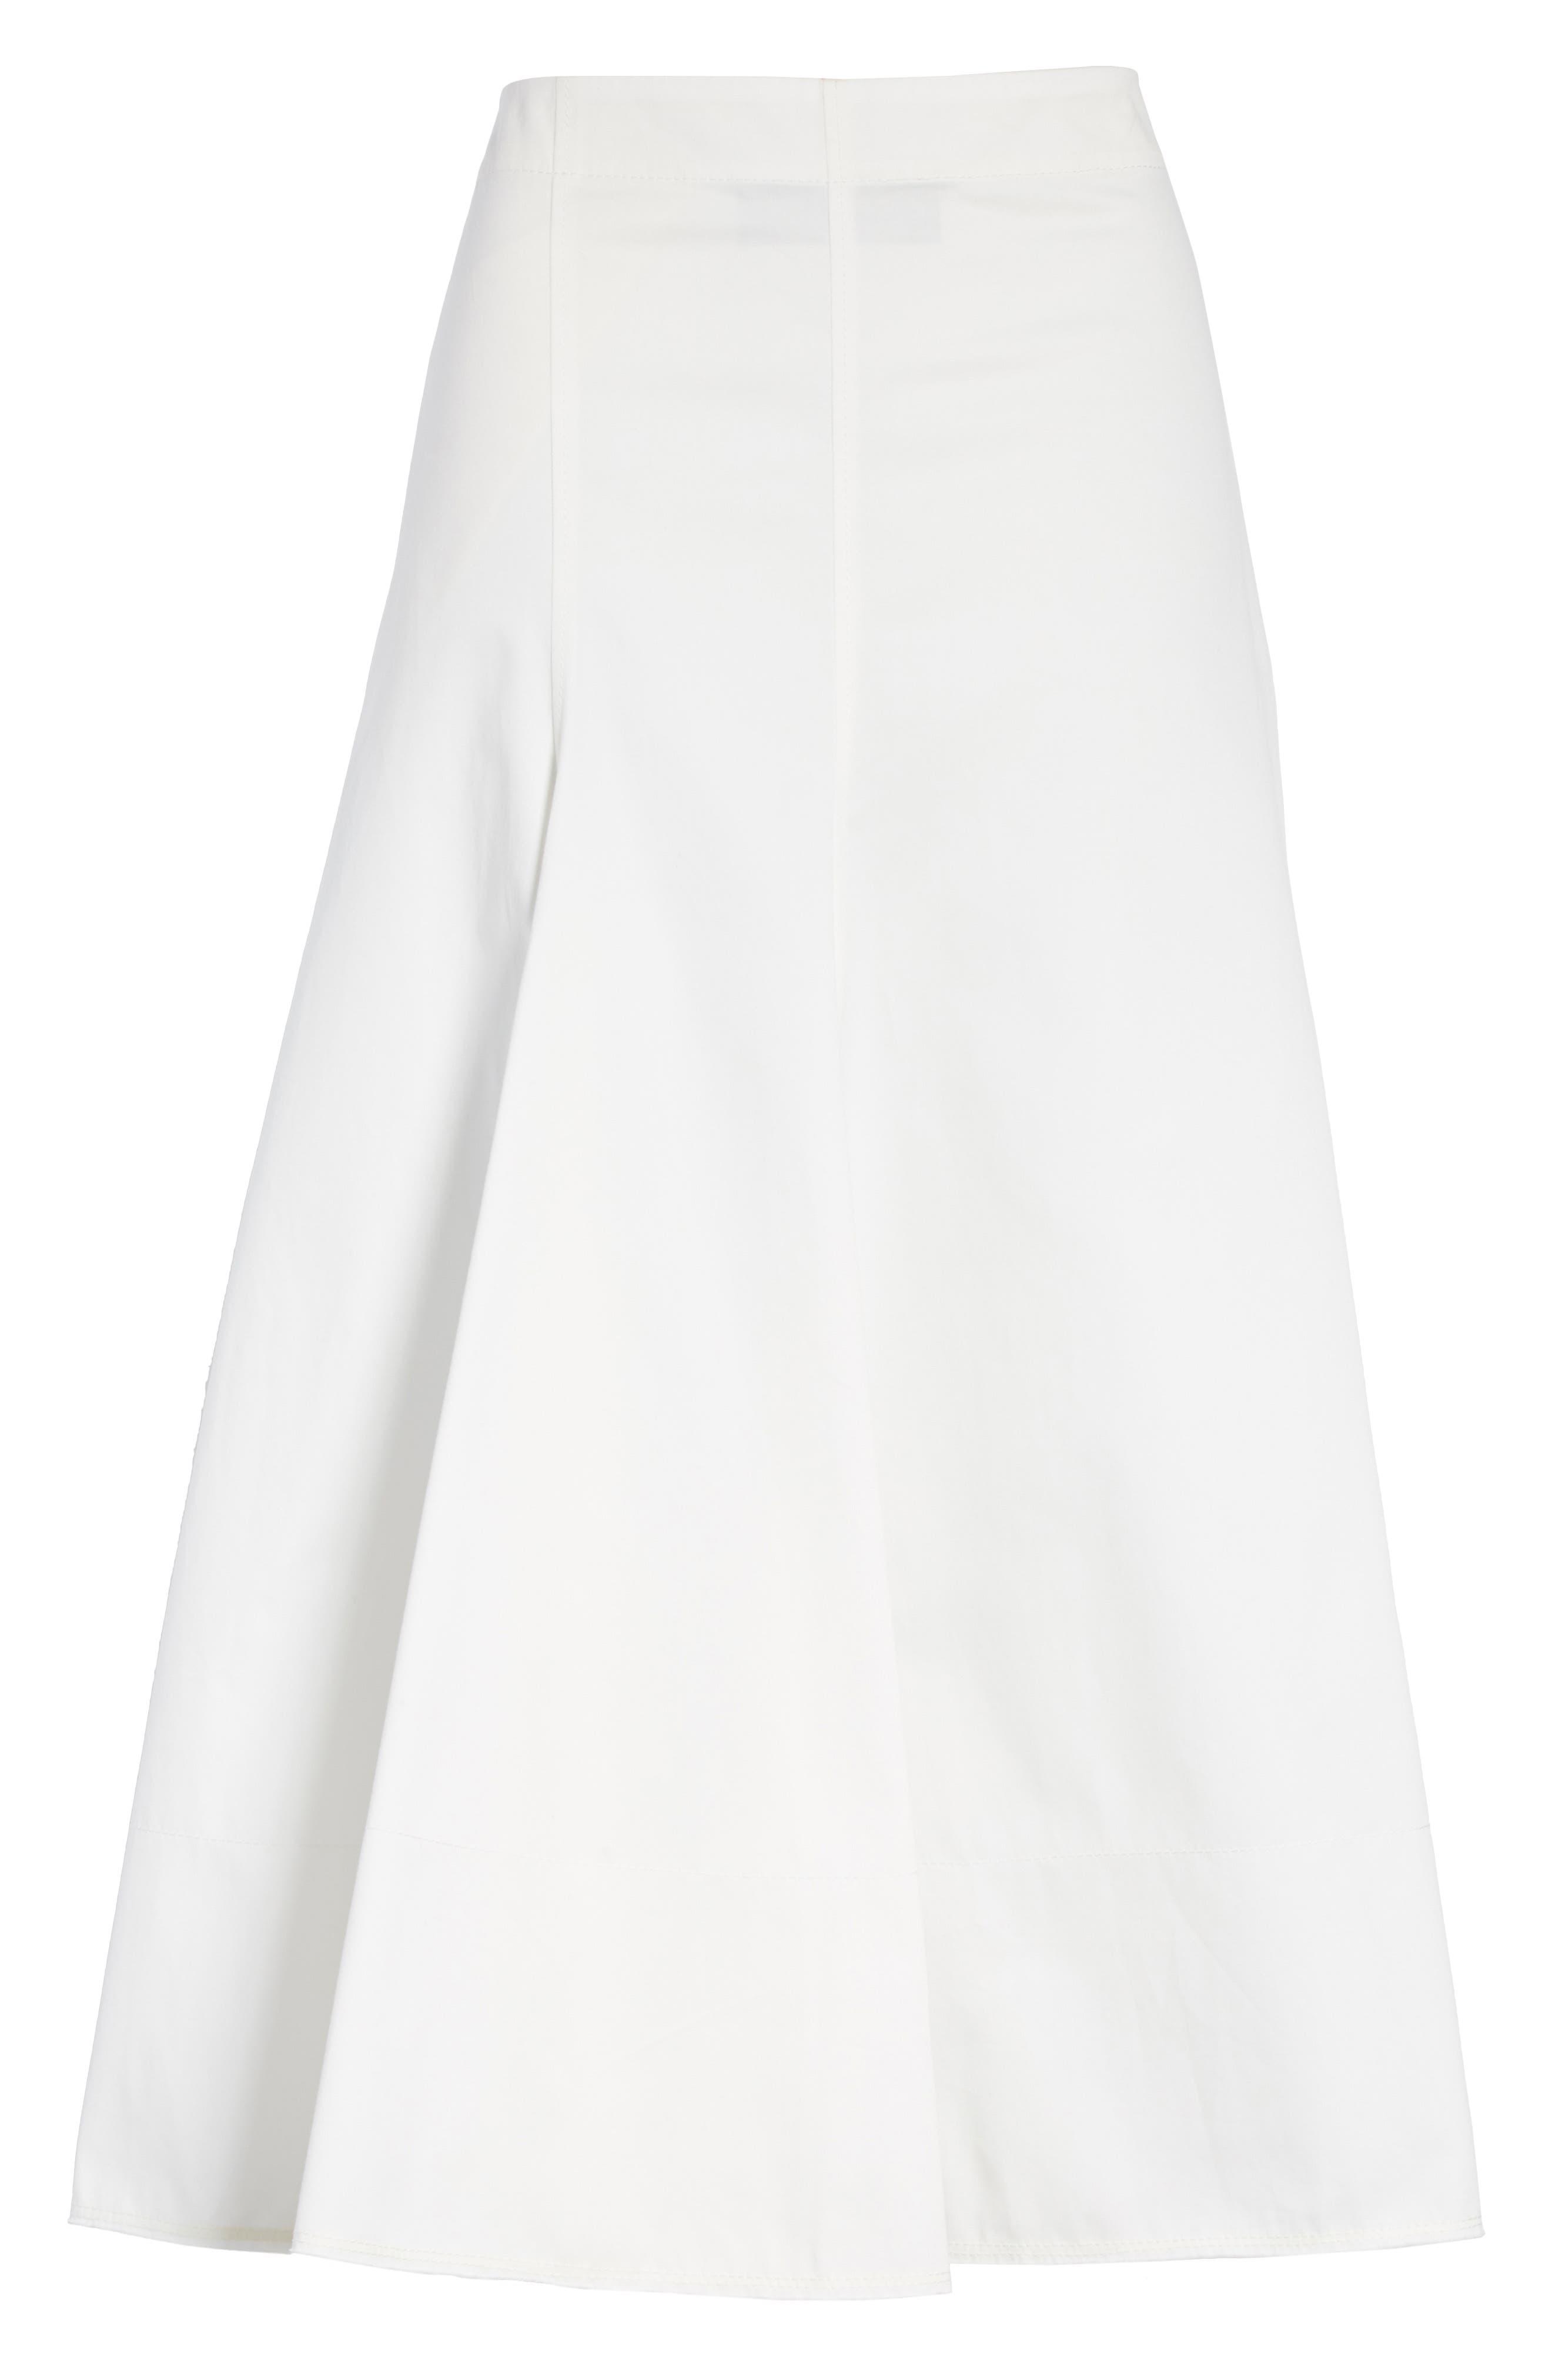 Twill Chino Midi Skirt,                             Alternate thumbnail 6, color,                             Ecru